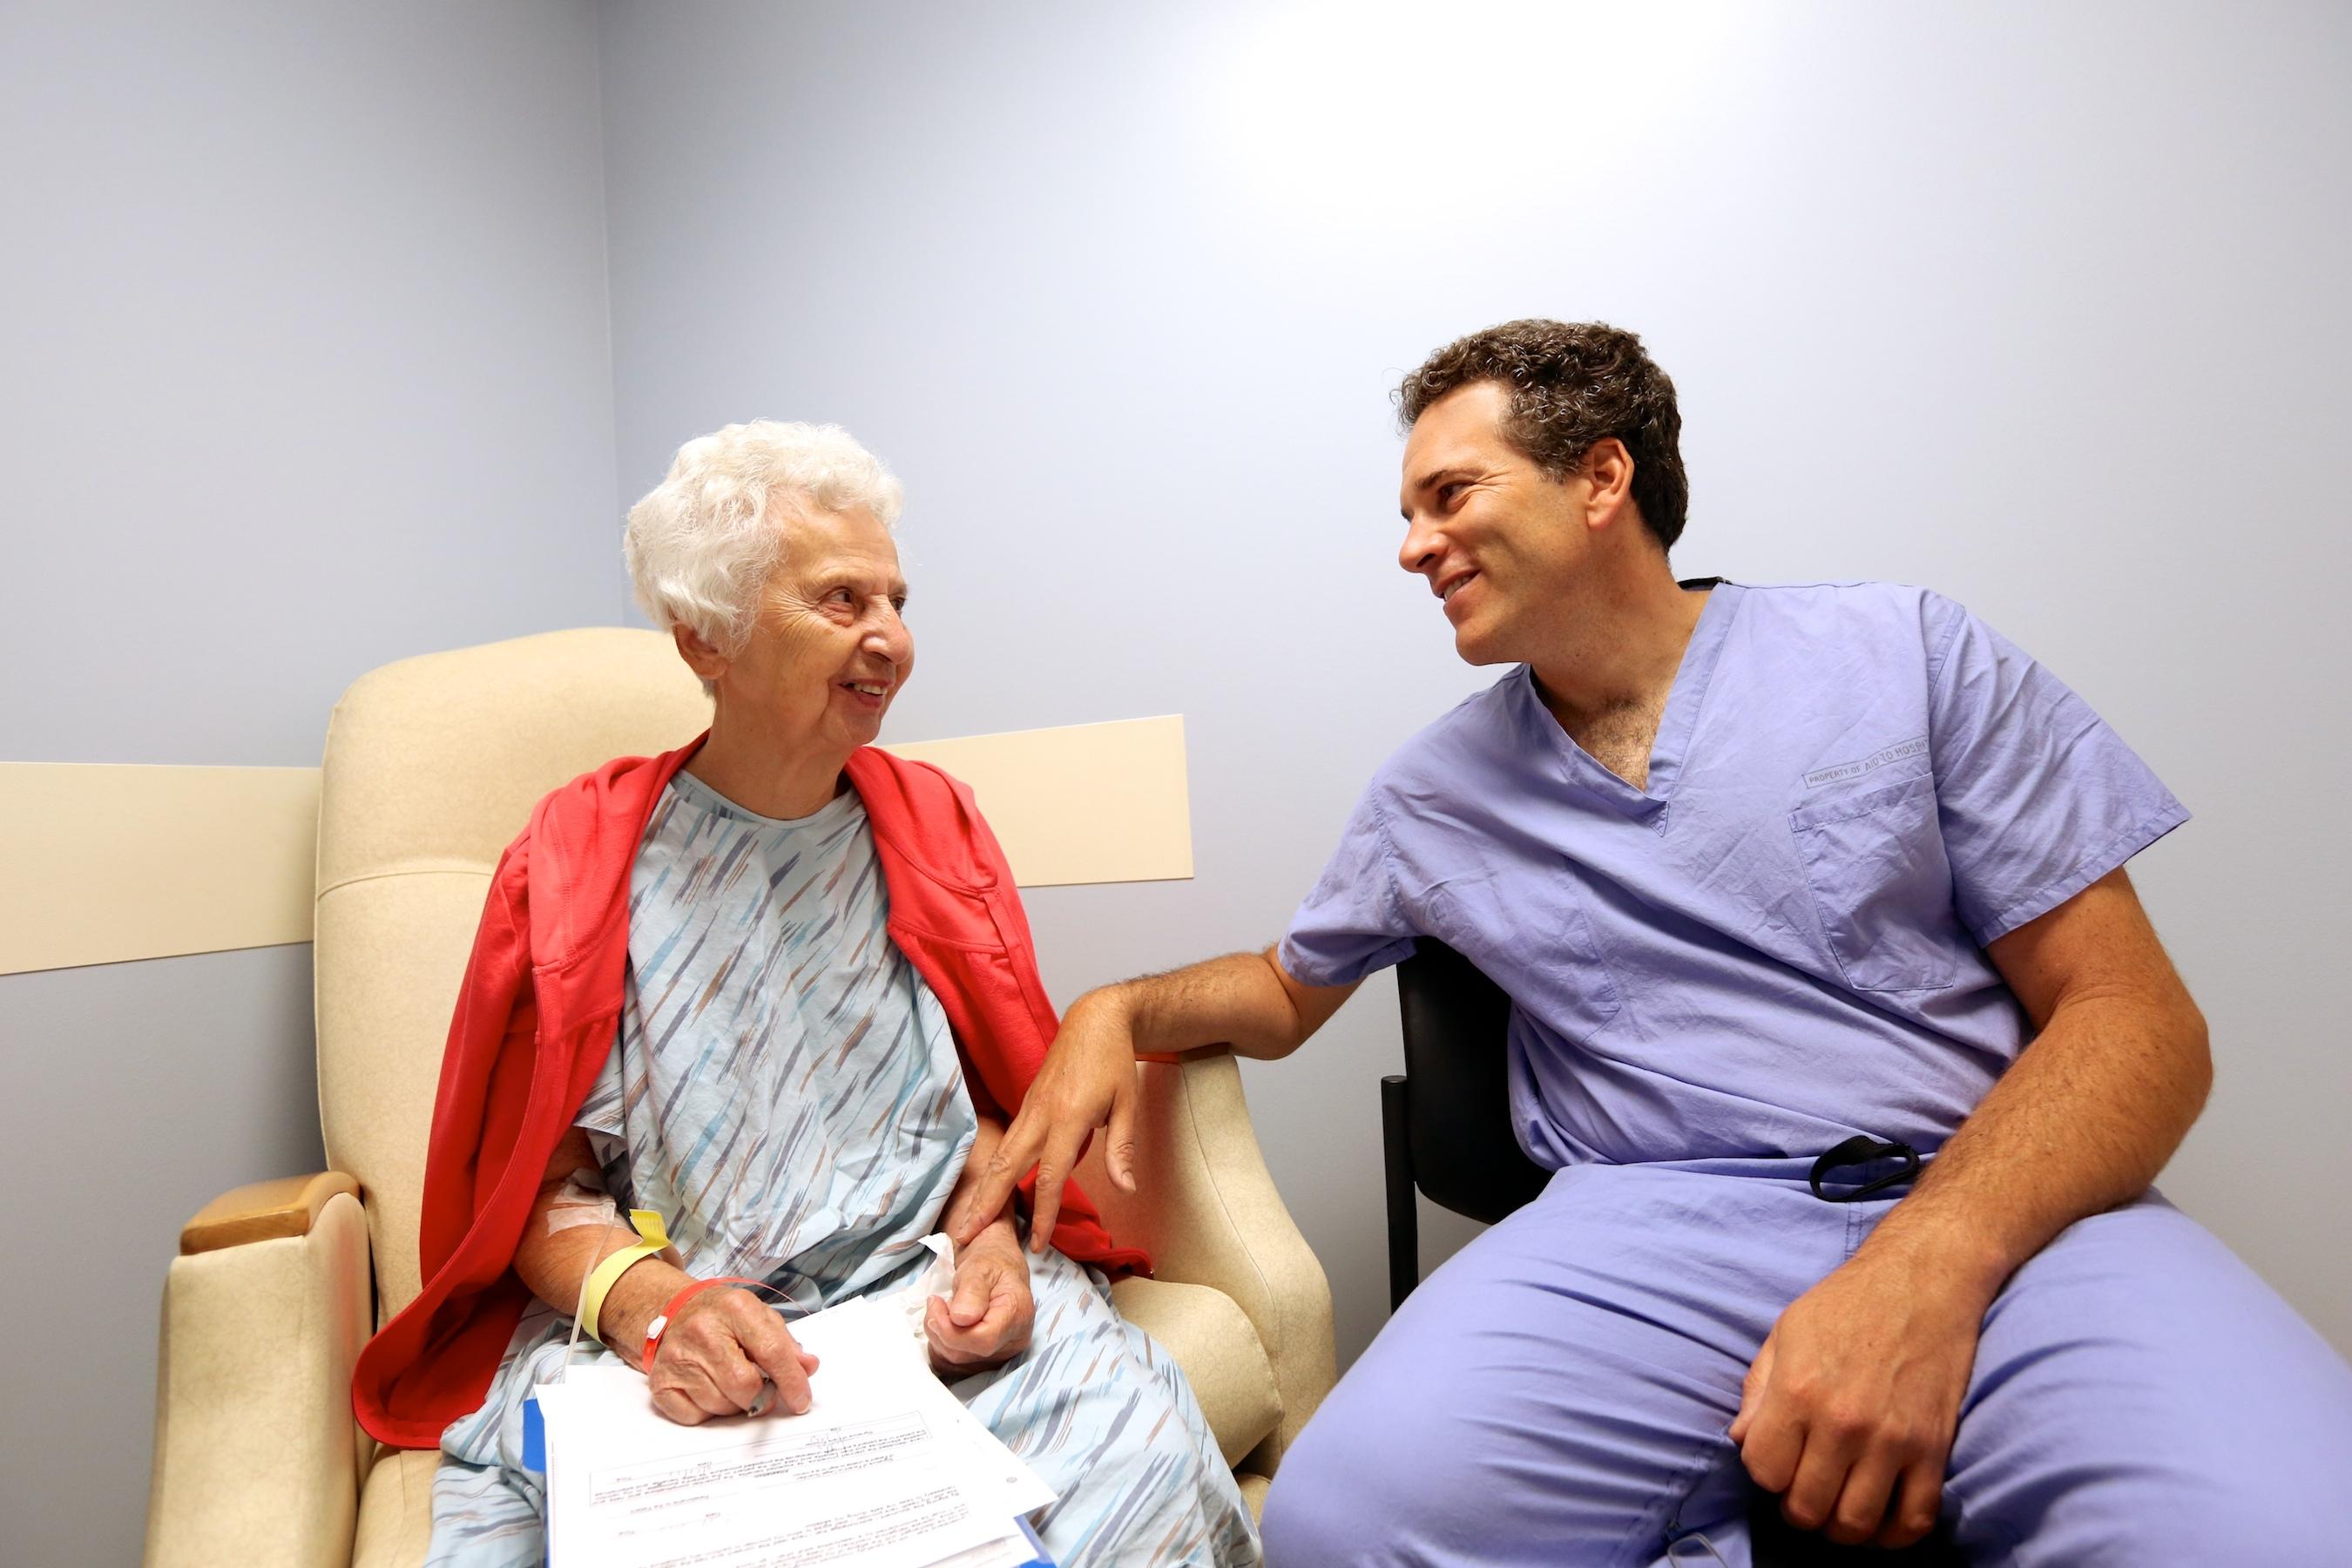 John Markman with patient